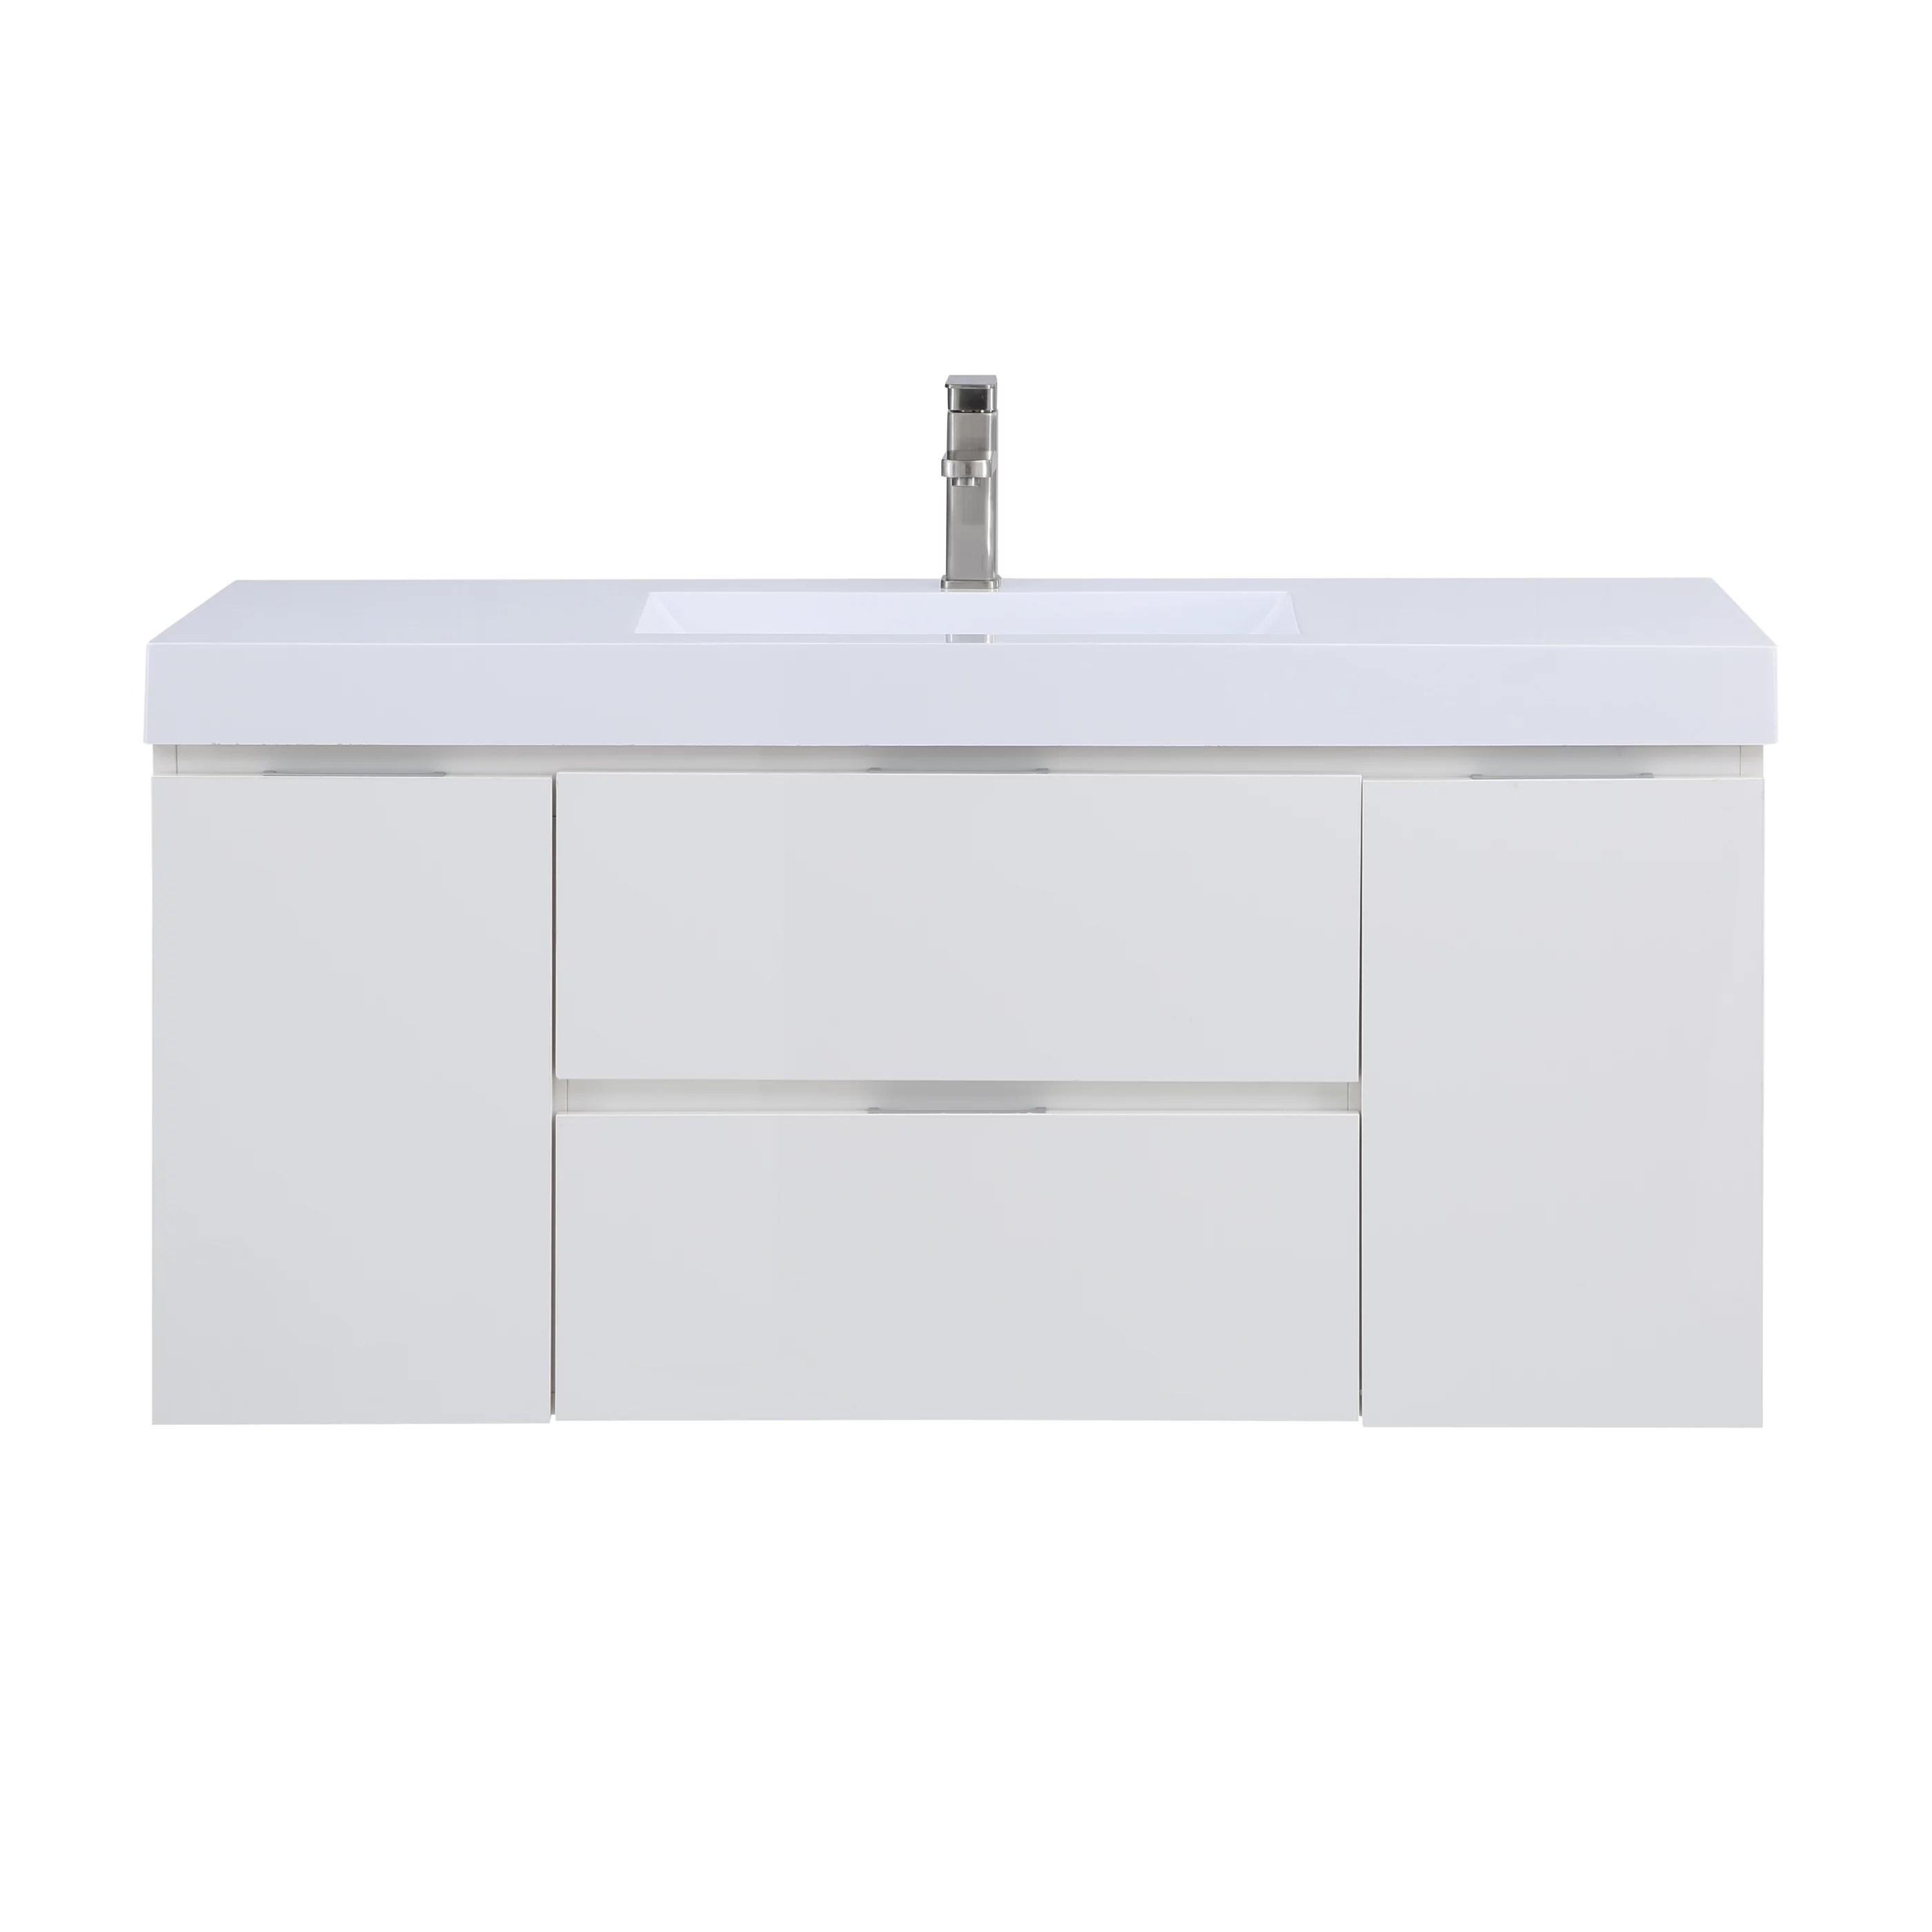 stufurhome helena gloss white 49 inch wall mounted single sink bathroom vanity no mirror walmart com